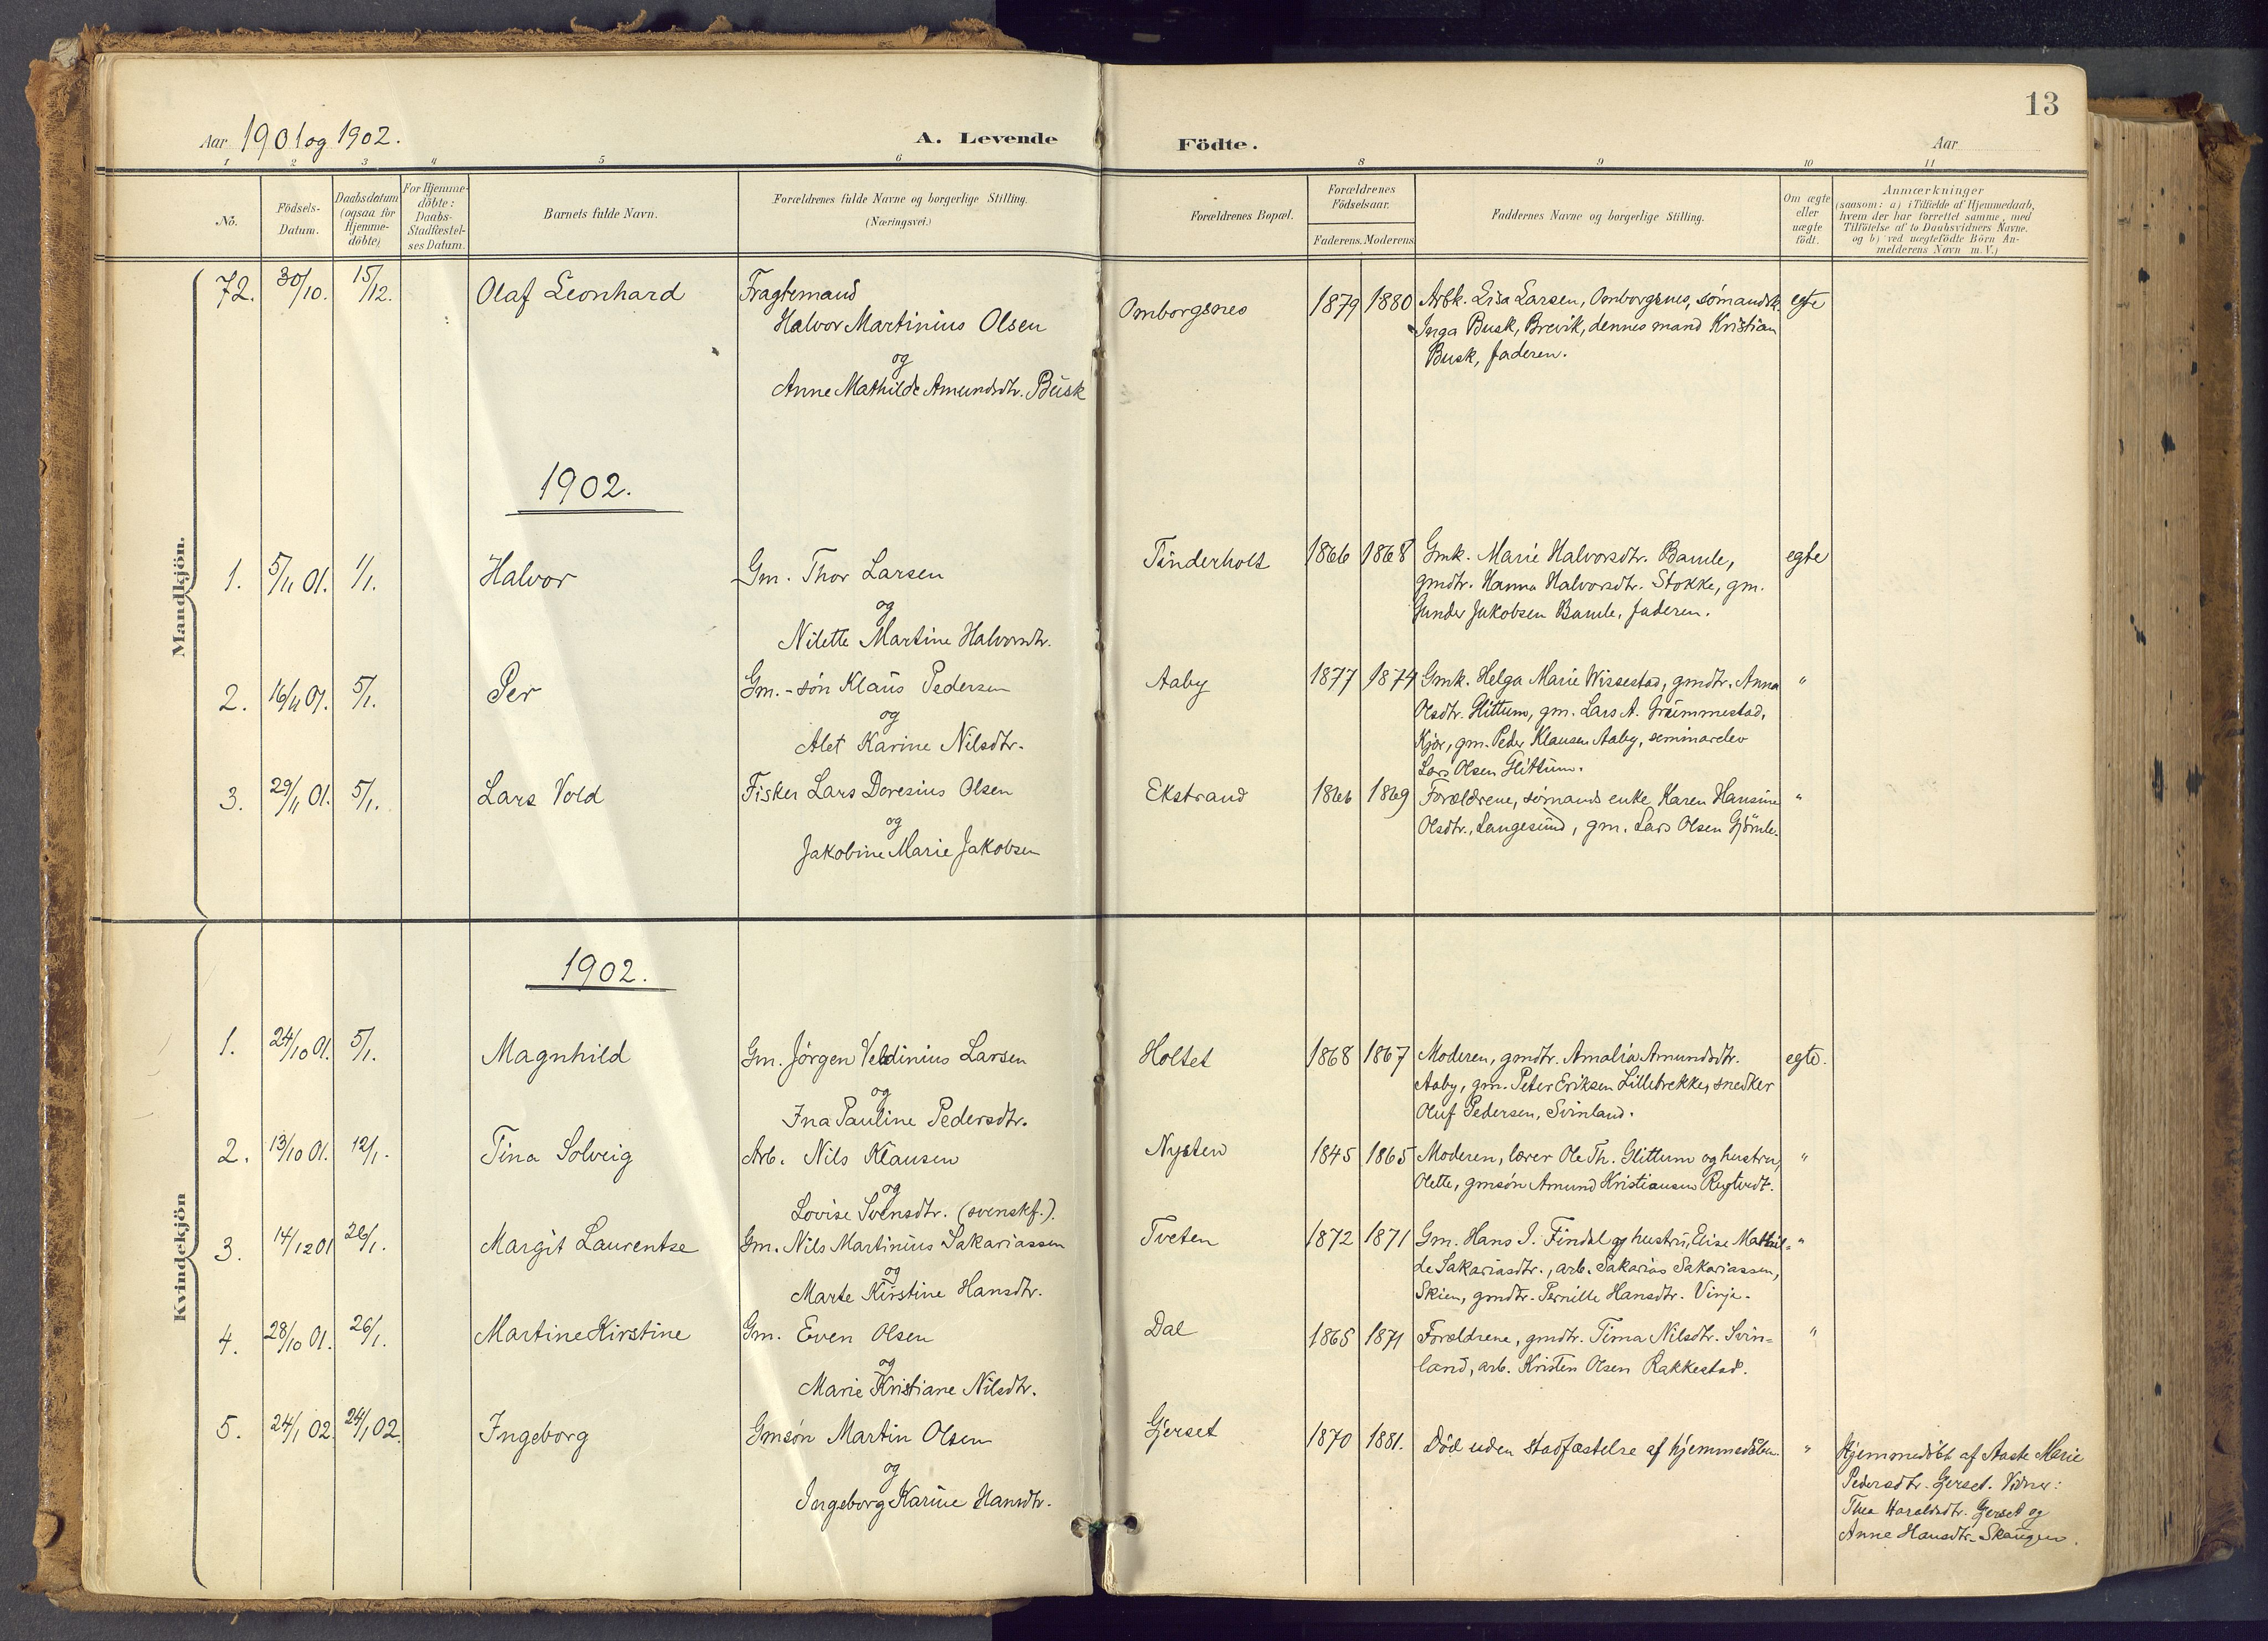 SAKO, Bamble kirkebøker, F/Fa/L0009: Ministerialbok nr. I 9, 1901-1917, s. 13